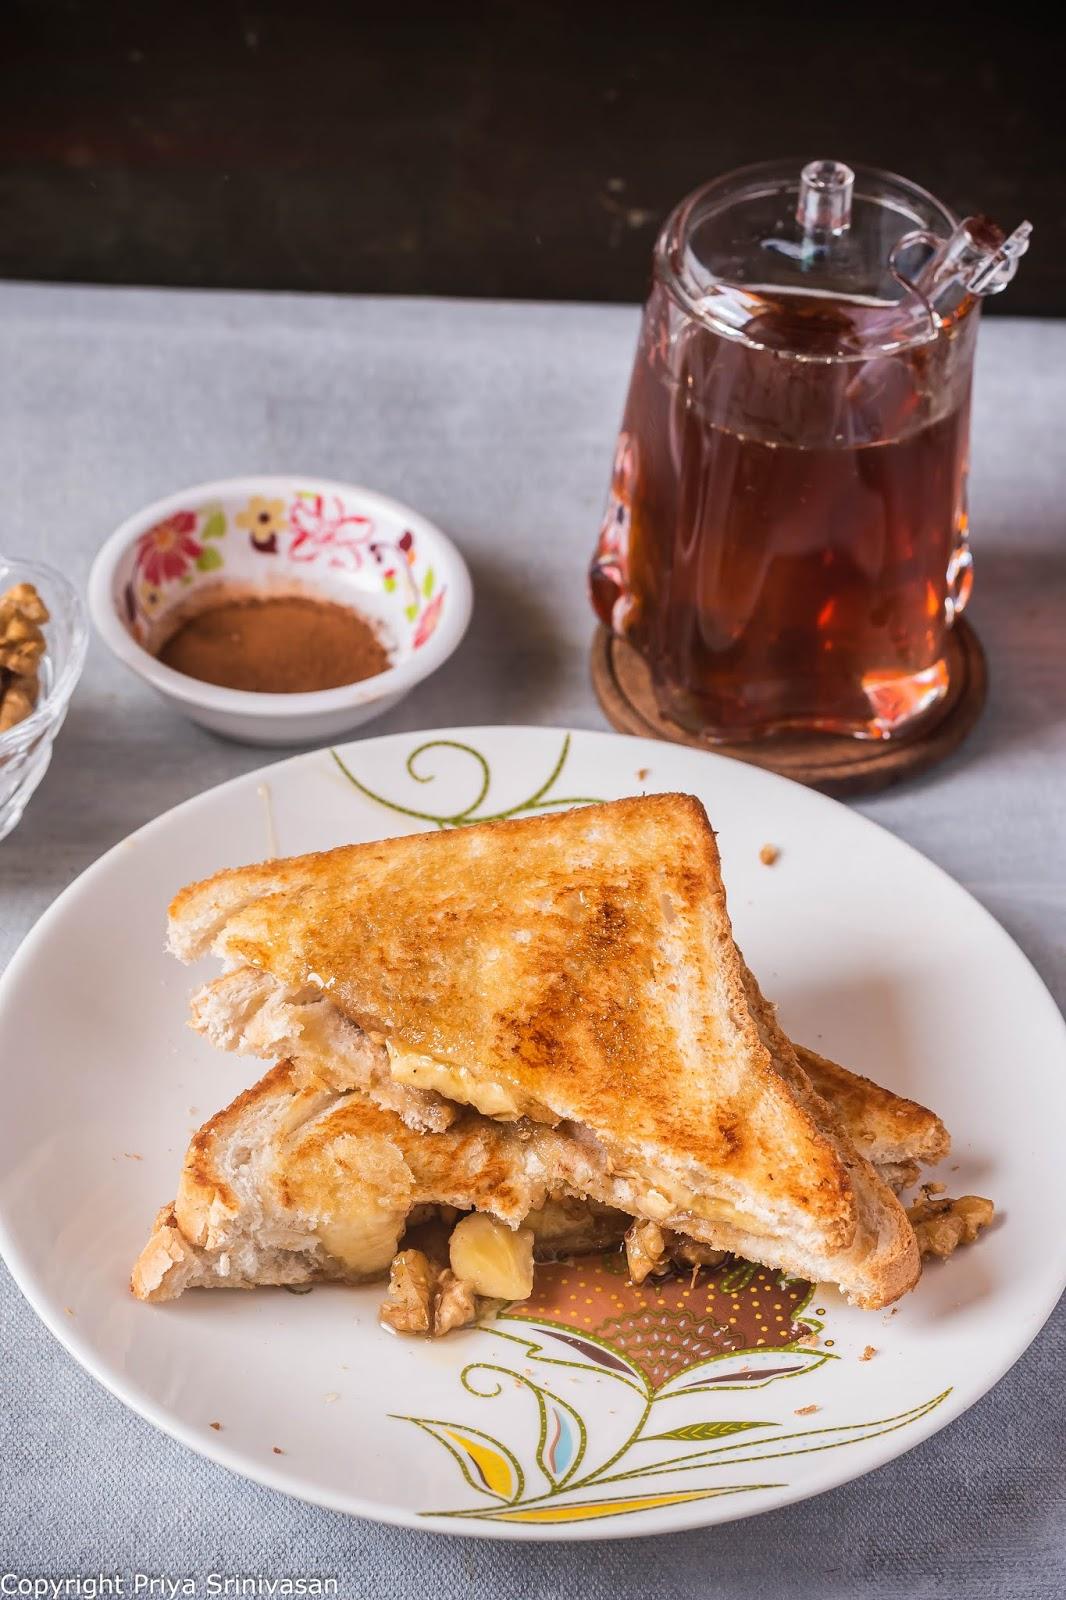 honey and nut sandwich